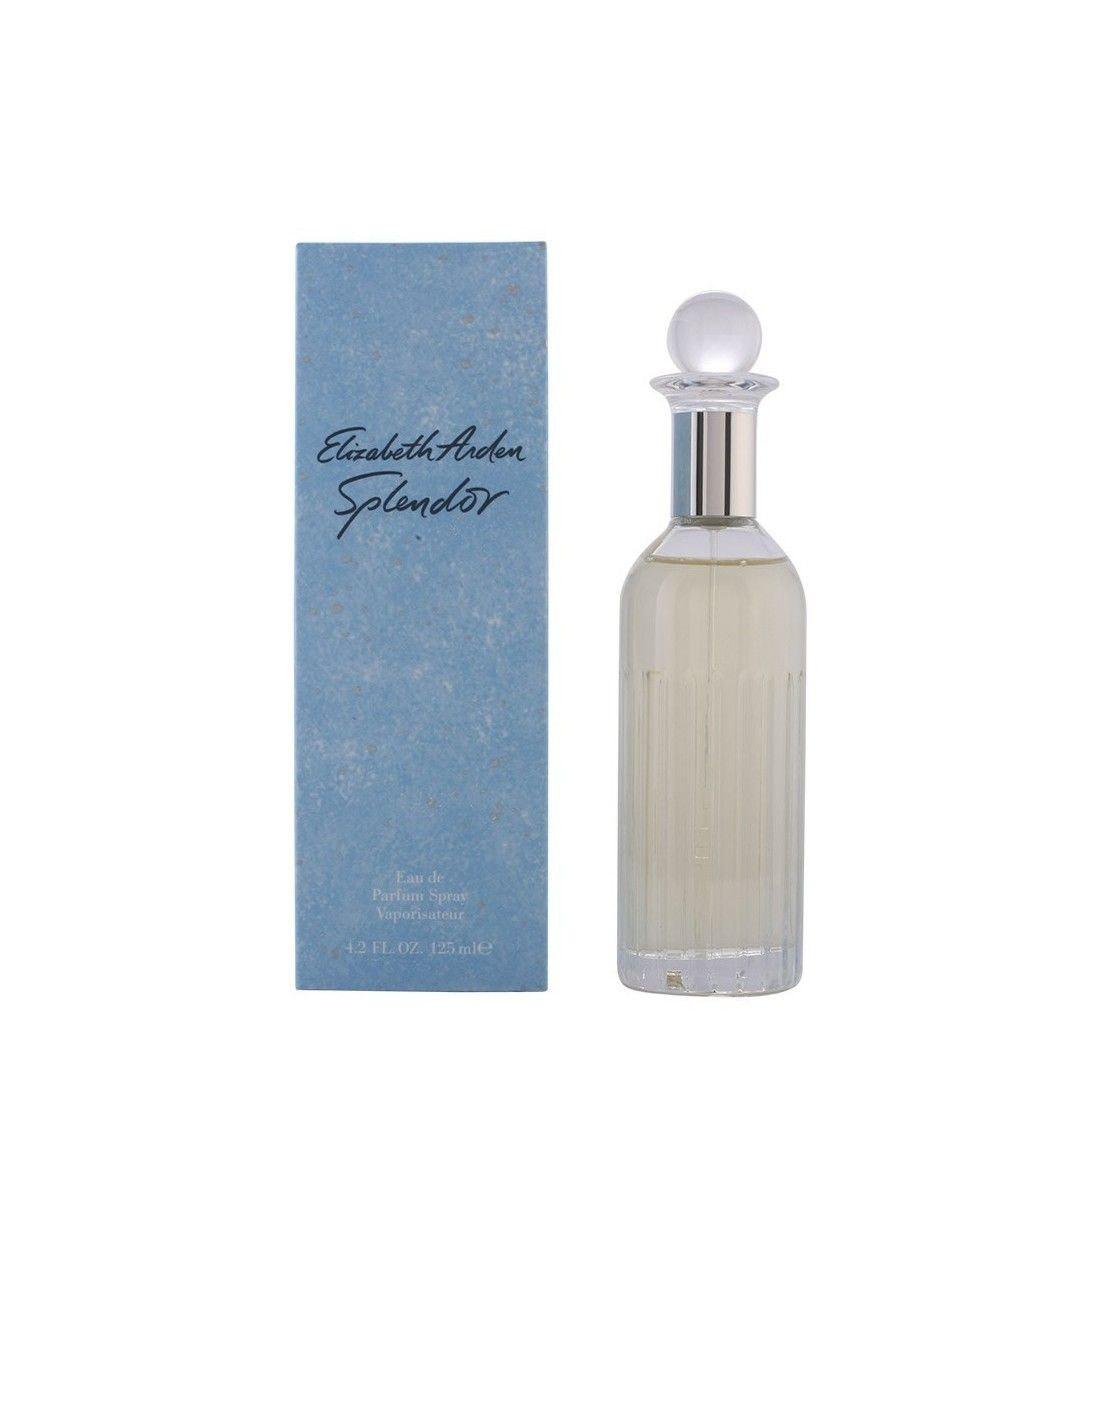 ELIZABETH ARDEN SPLENDOR eau de parfum vaporizador en 2020